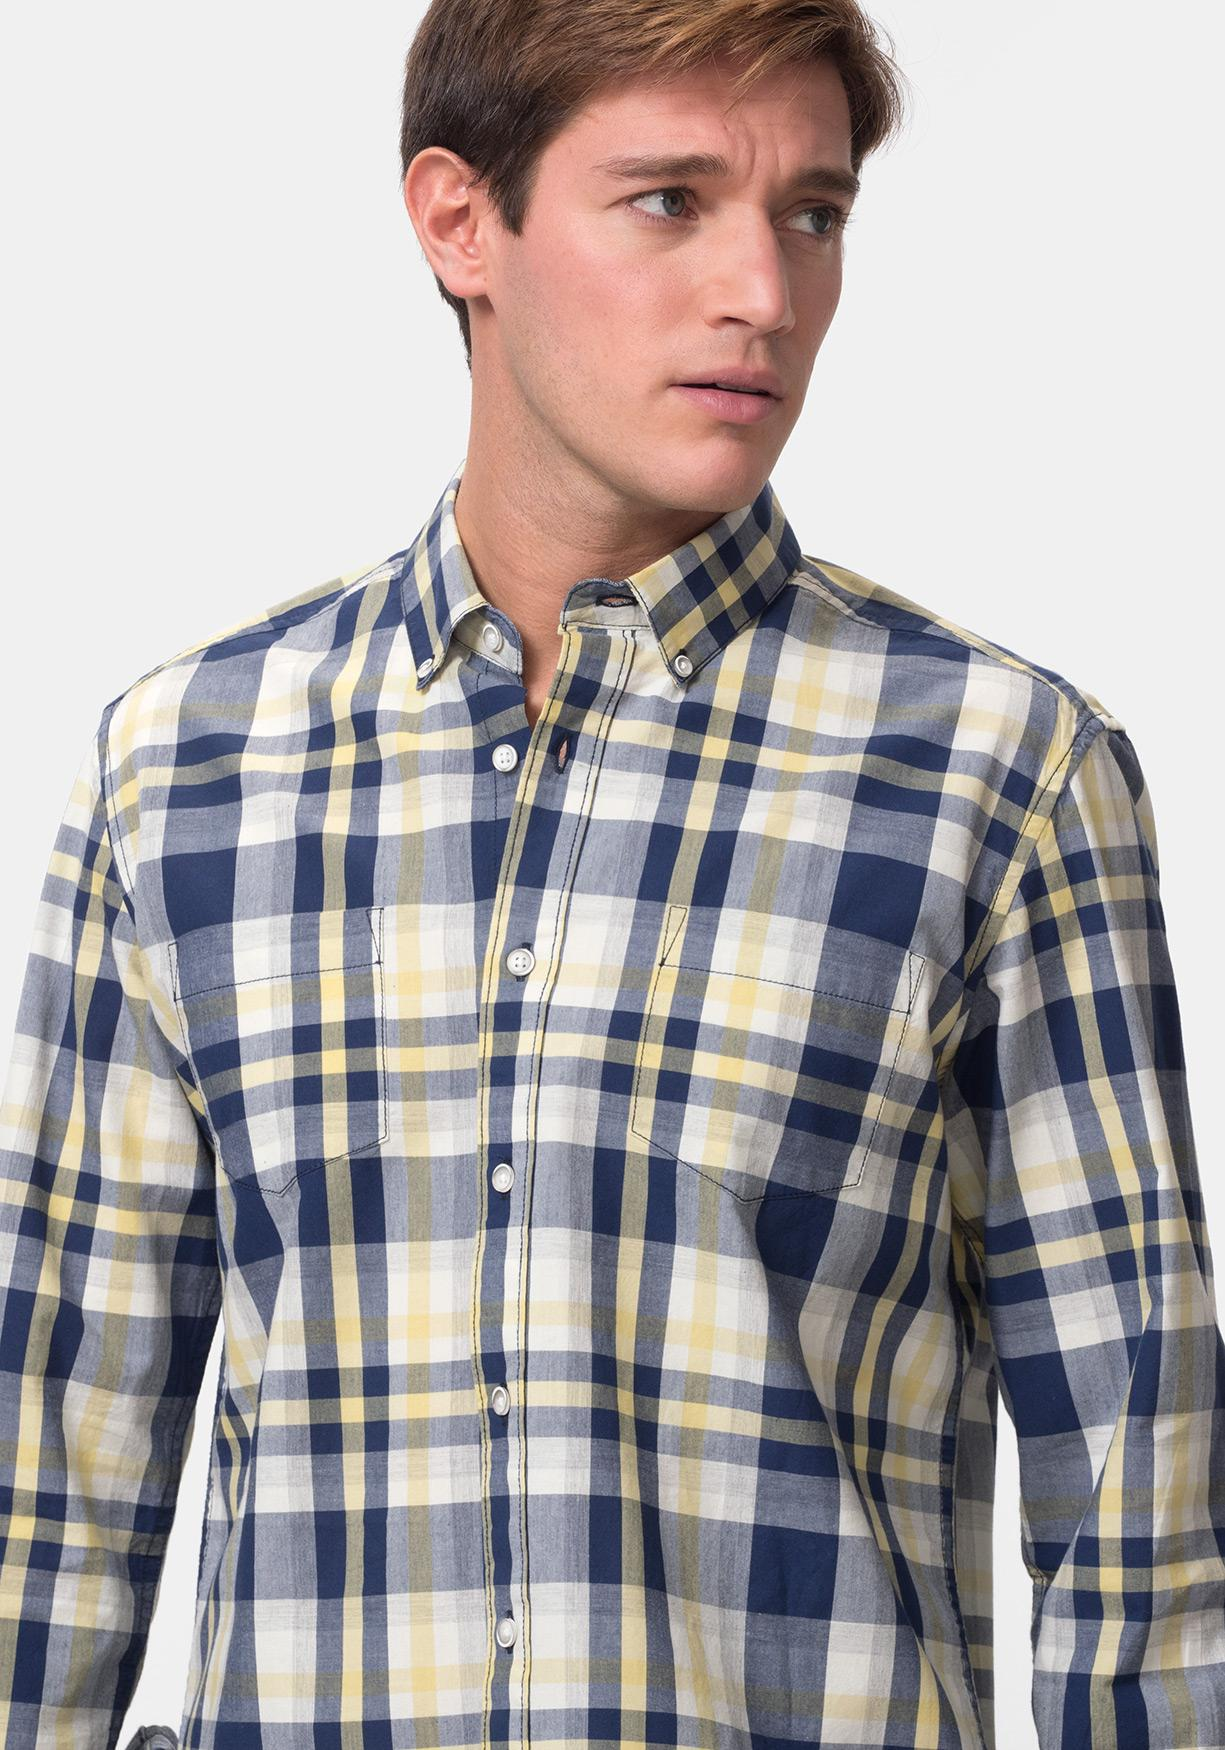 2d51692622144 Comprar Camisa de cuadros manga larga TEX. ¡Aprovéchate de nuestros ...